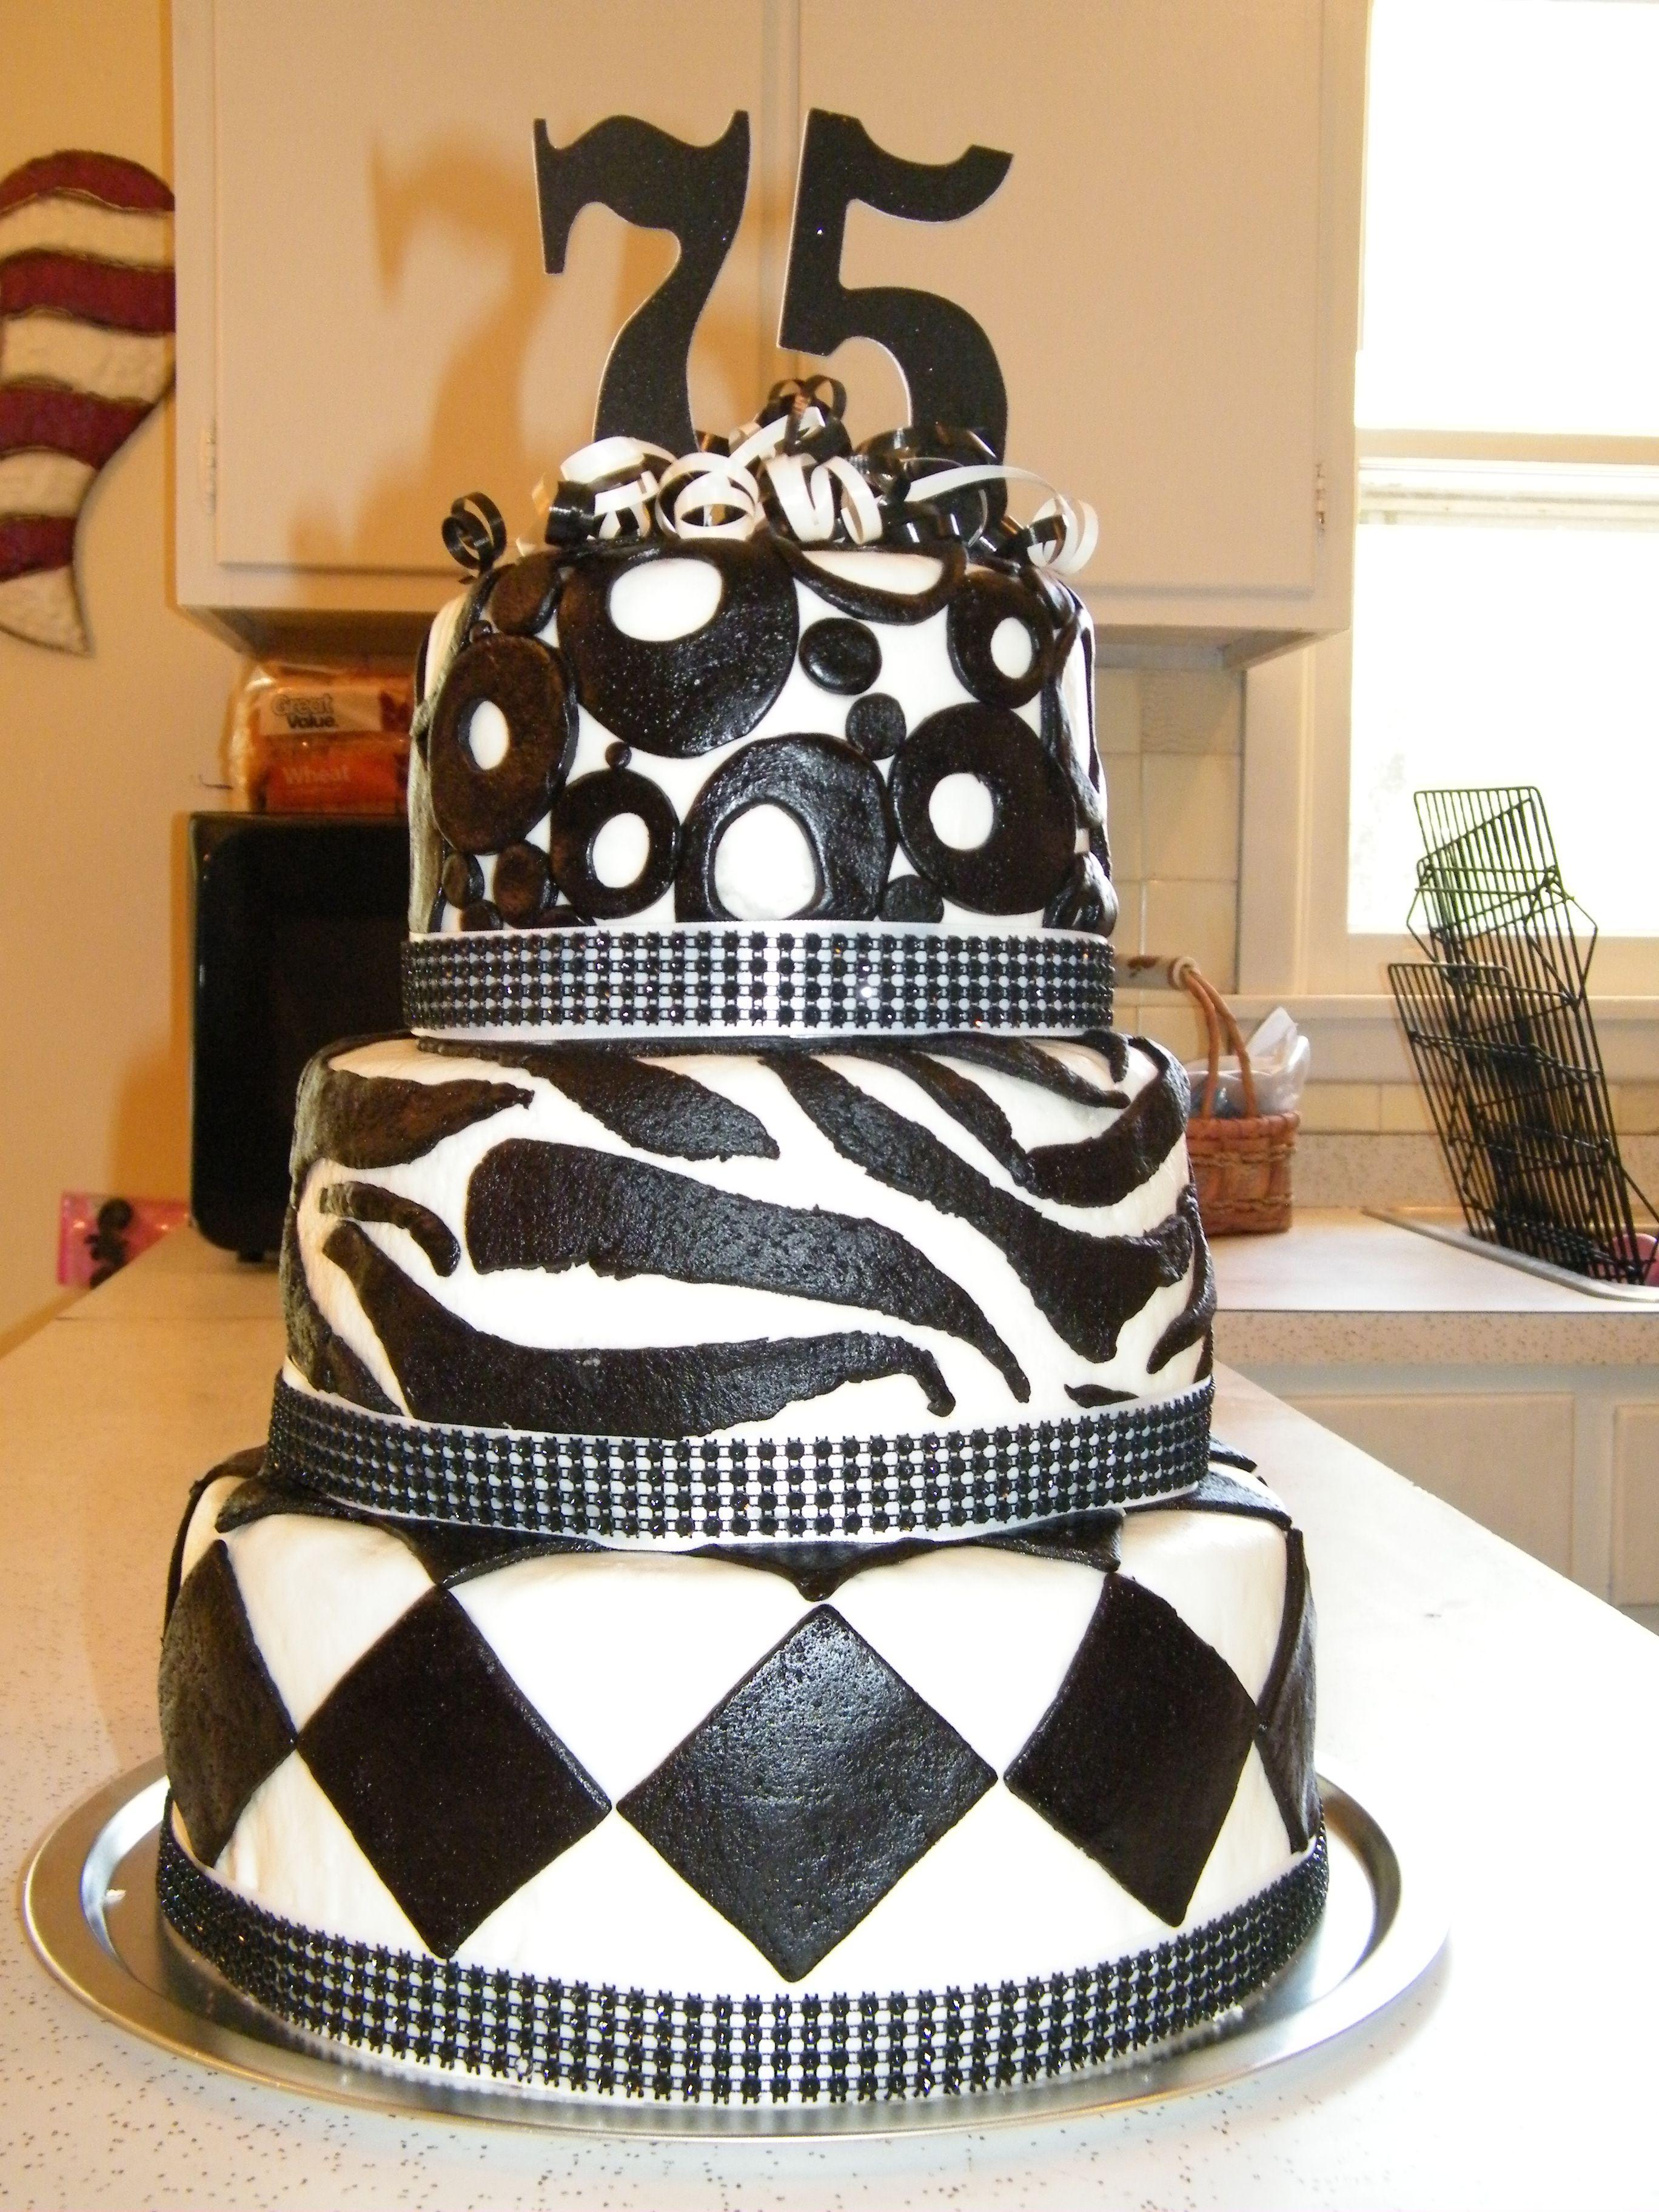 75th Birthday Cake 75 Birthday Cake Cake 75th Birthday